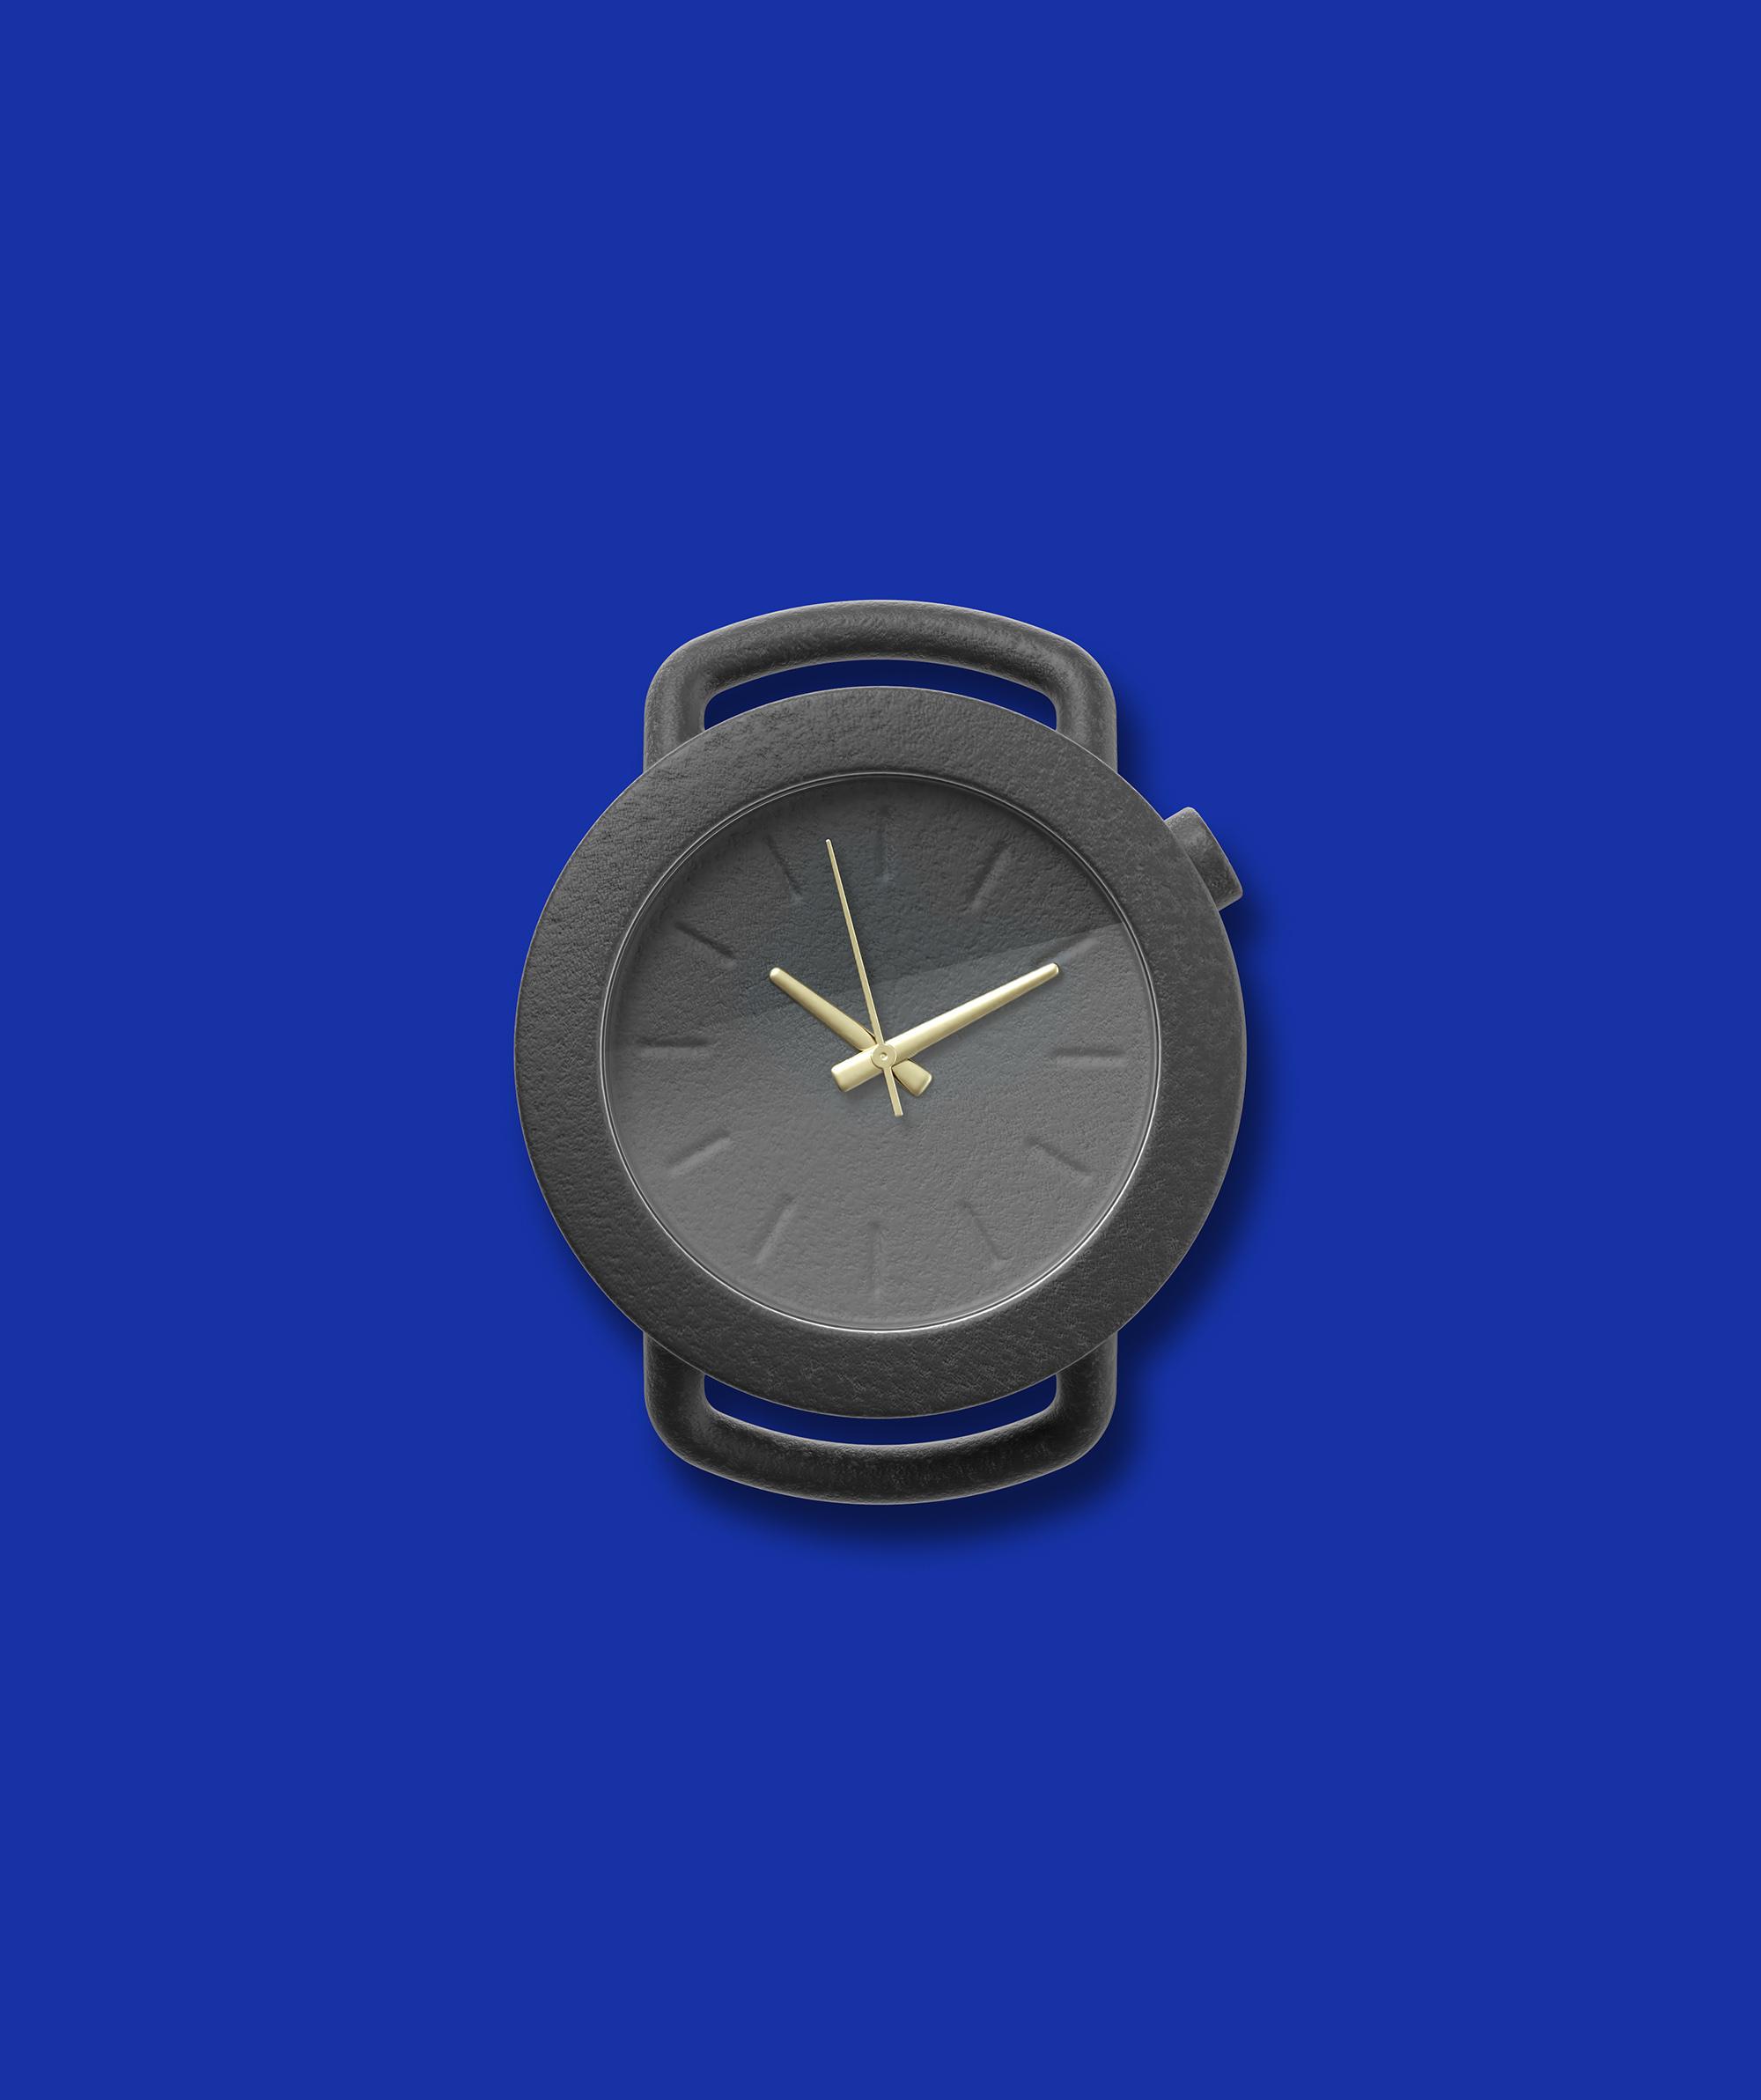 Andreas Bhend Industrial Design Studio NUGGET WATCH 12